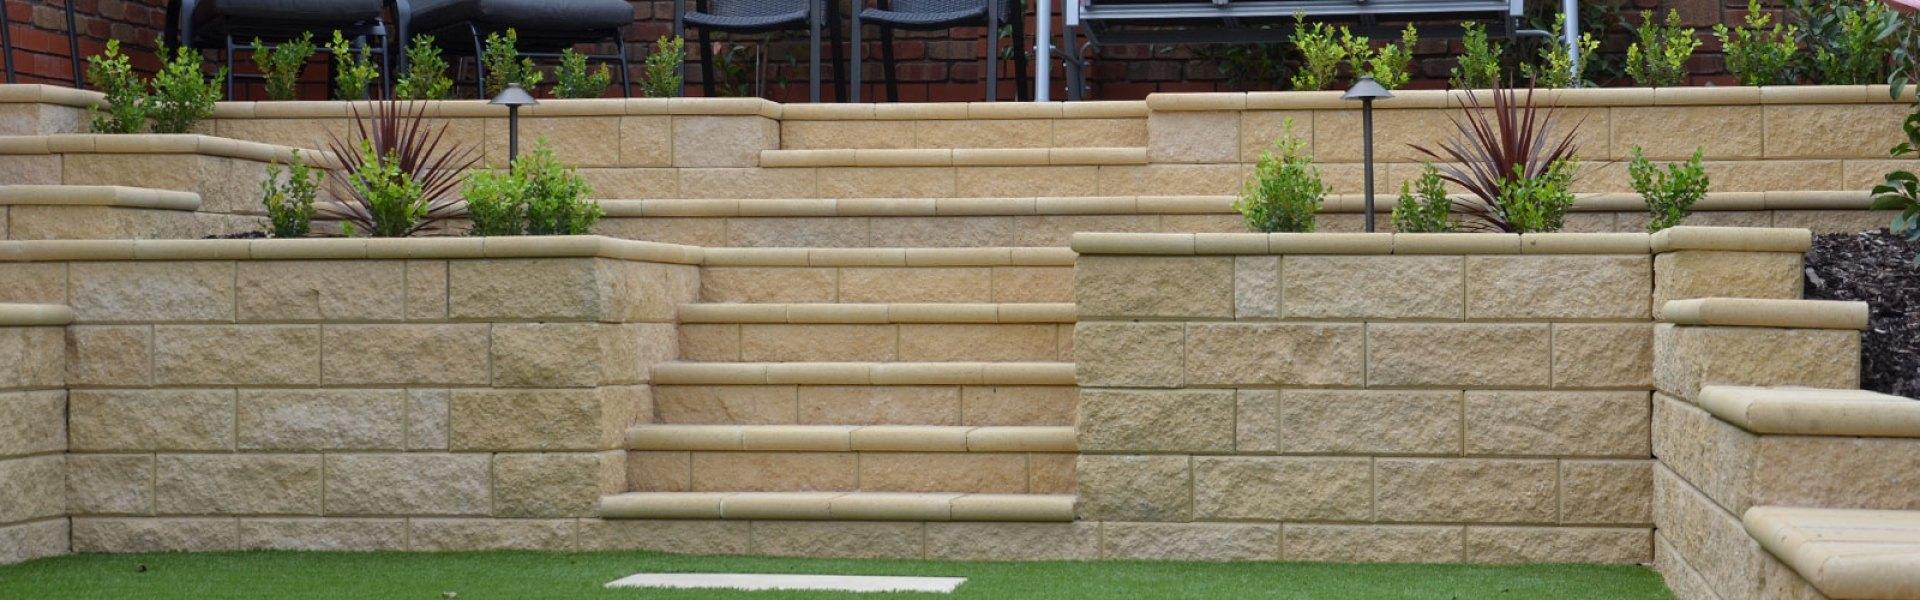 Retaining Walls Adelaide | Visual Landscape Gardening